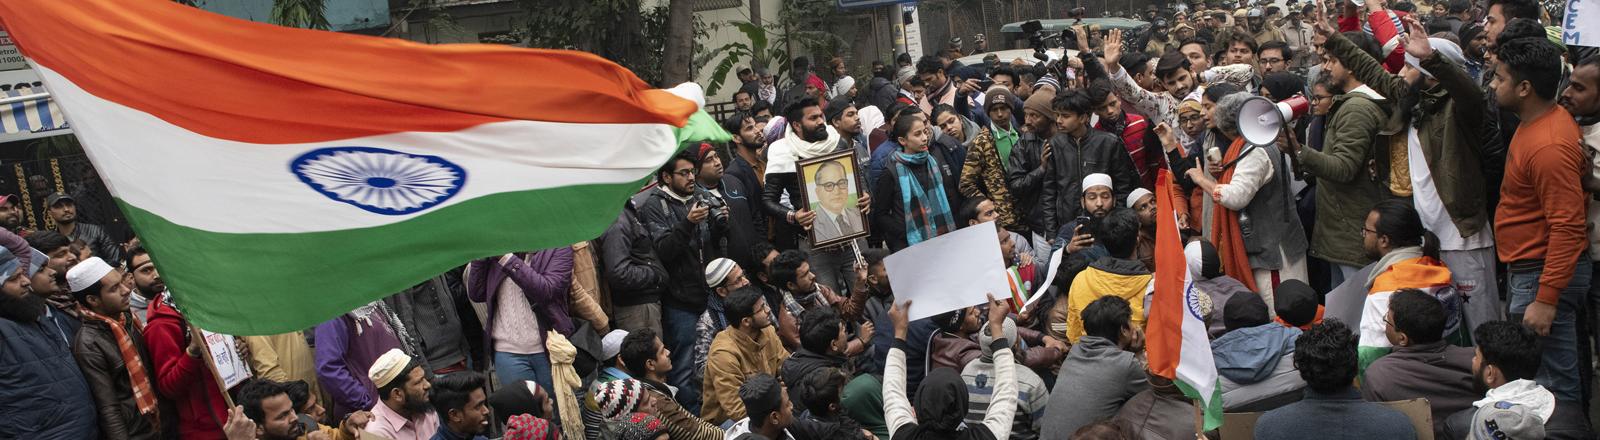 Protest in Neu Delhi am 19. Dezember 2019